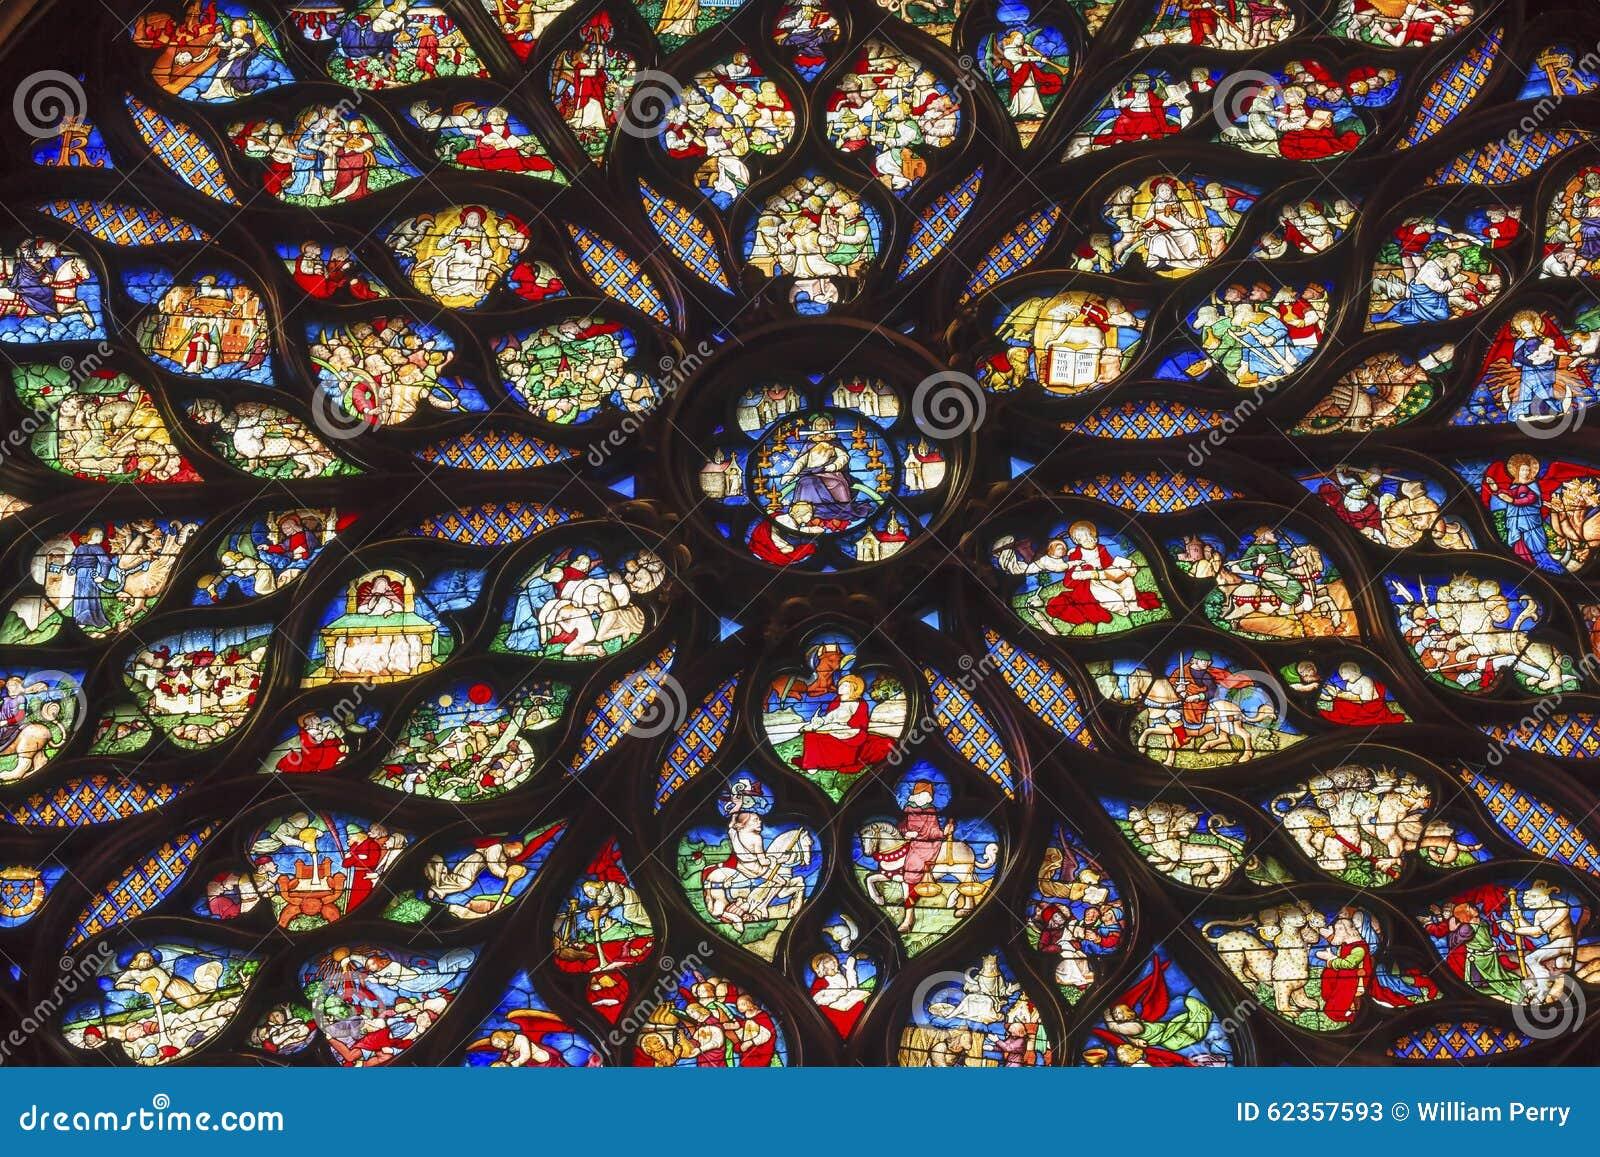 Jesus Rose Window Stained Glass Sainte Chapelle Paris France